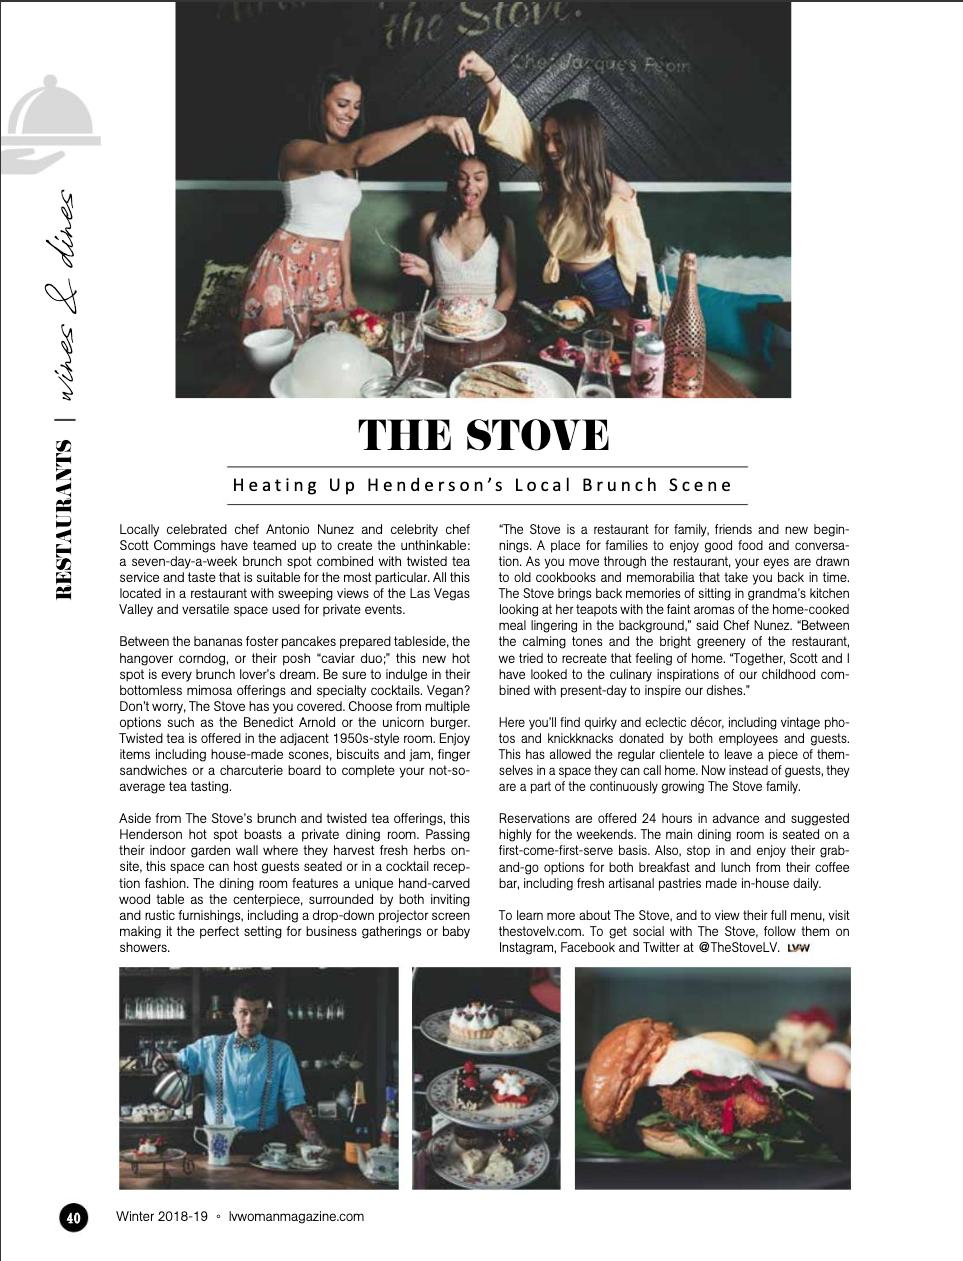 the-stove-las-vegas-woman-magazine-casey-jade-photo